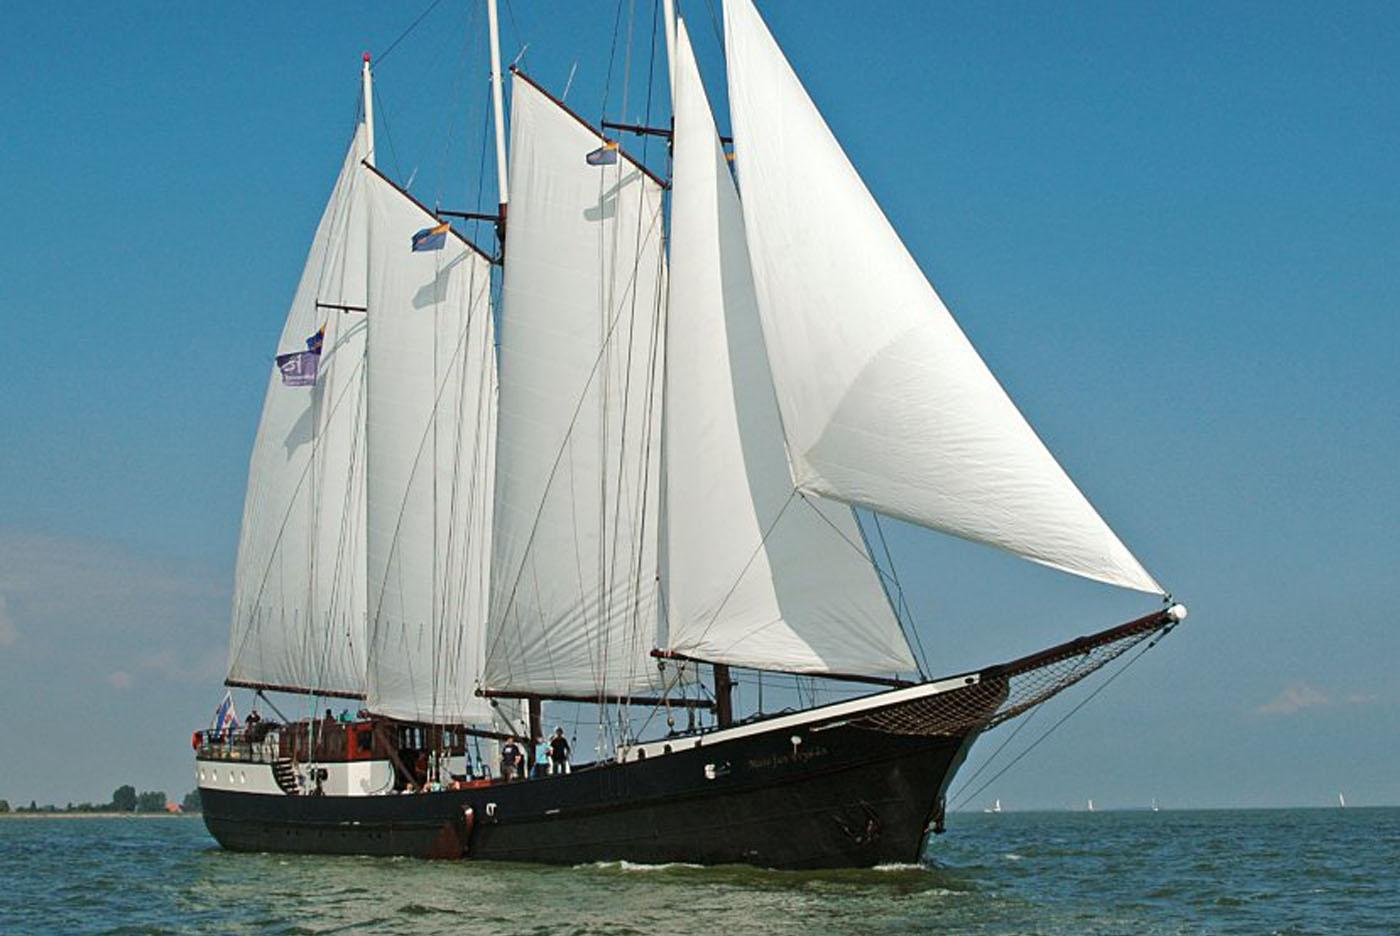 Segeln auf IJsselmeer oder Wattenmeer mit der Schoner Mare Fan Fryslan ab Enkhuizen